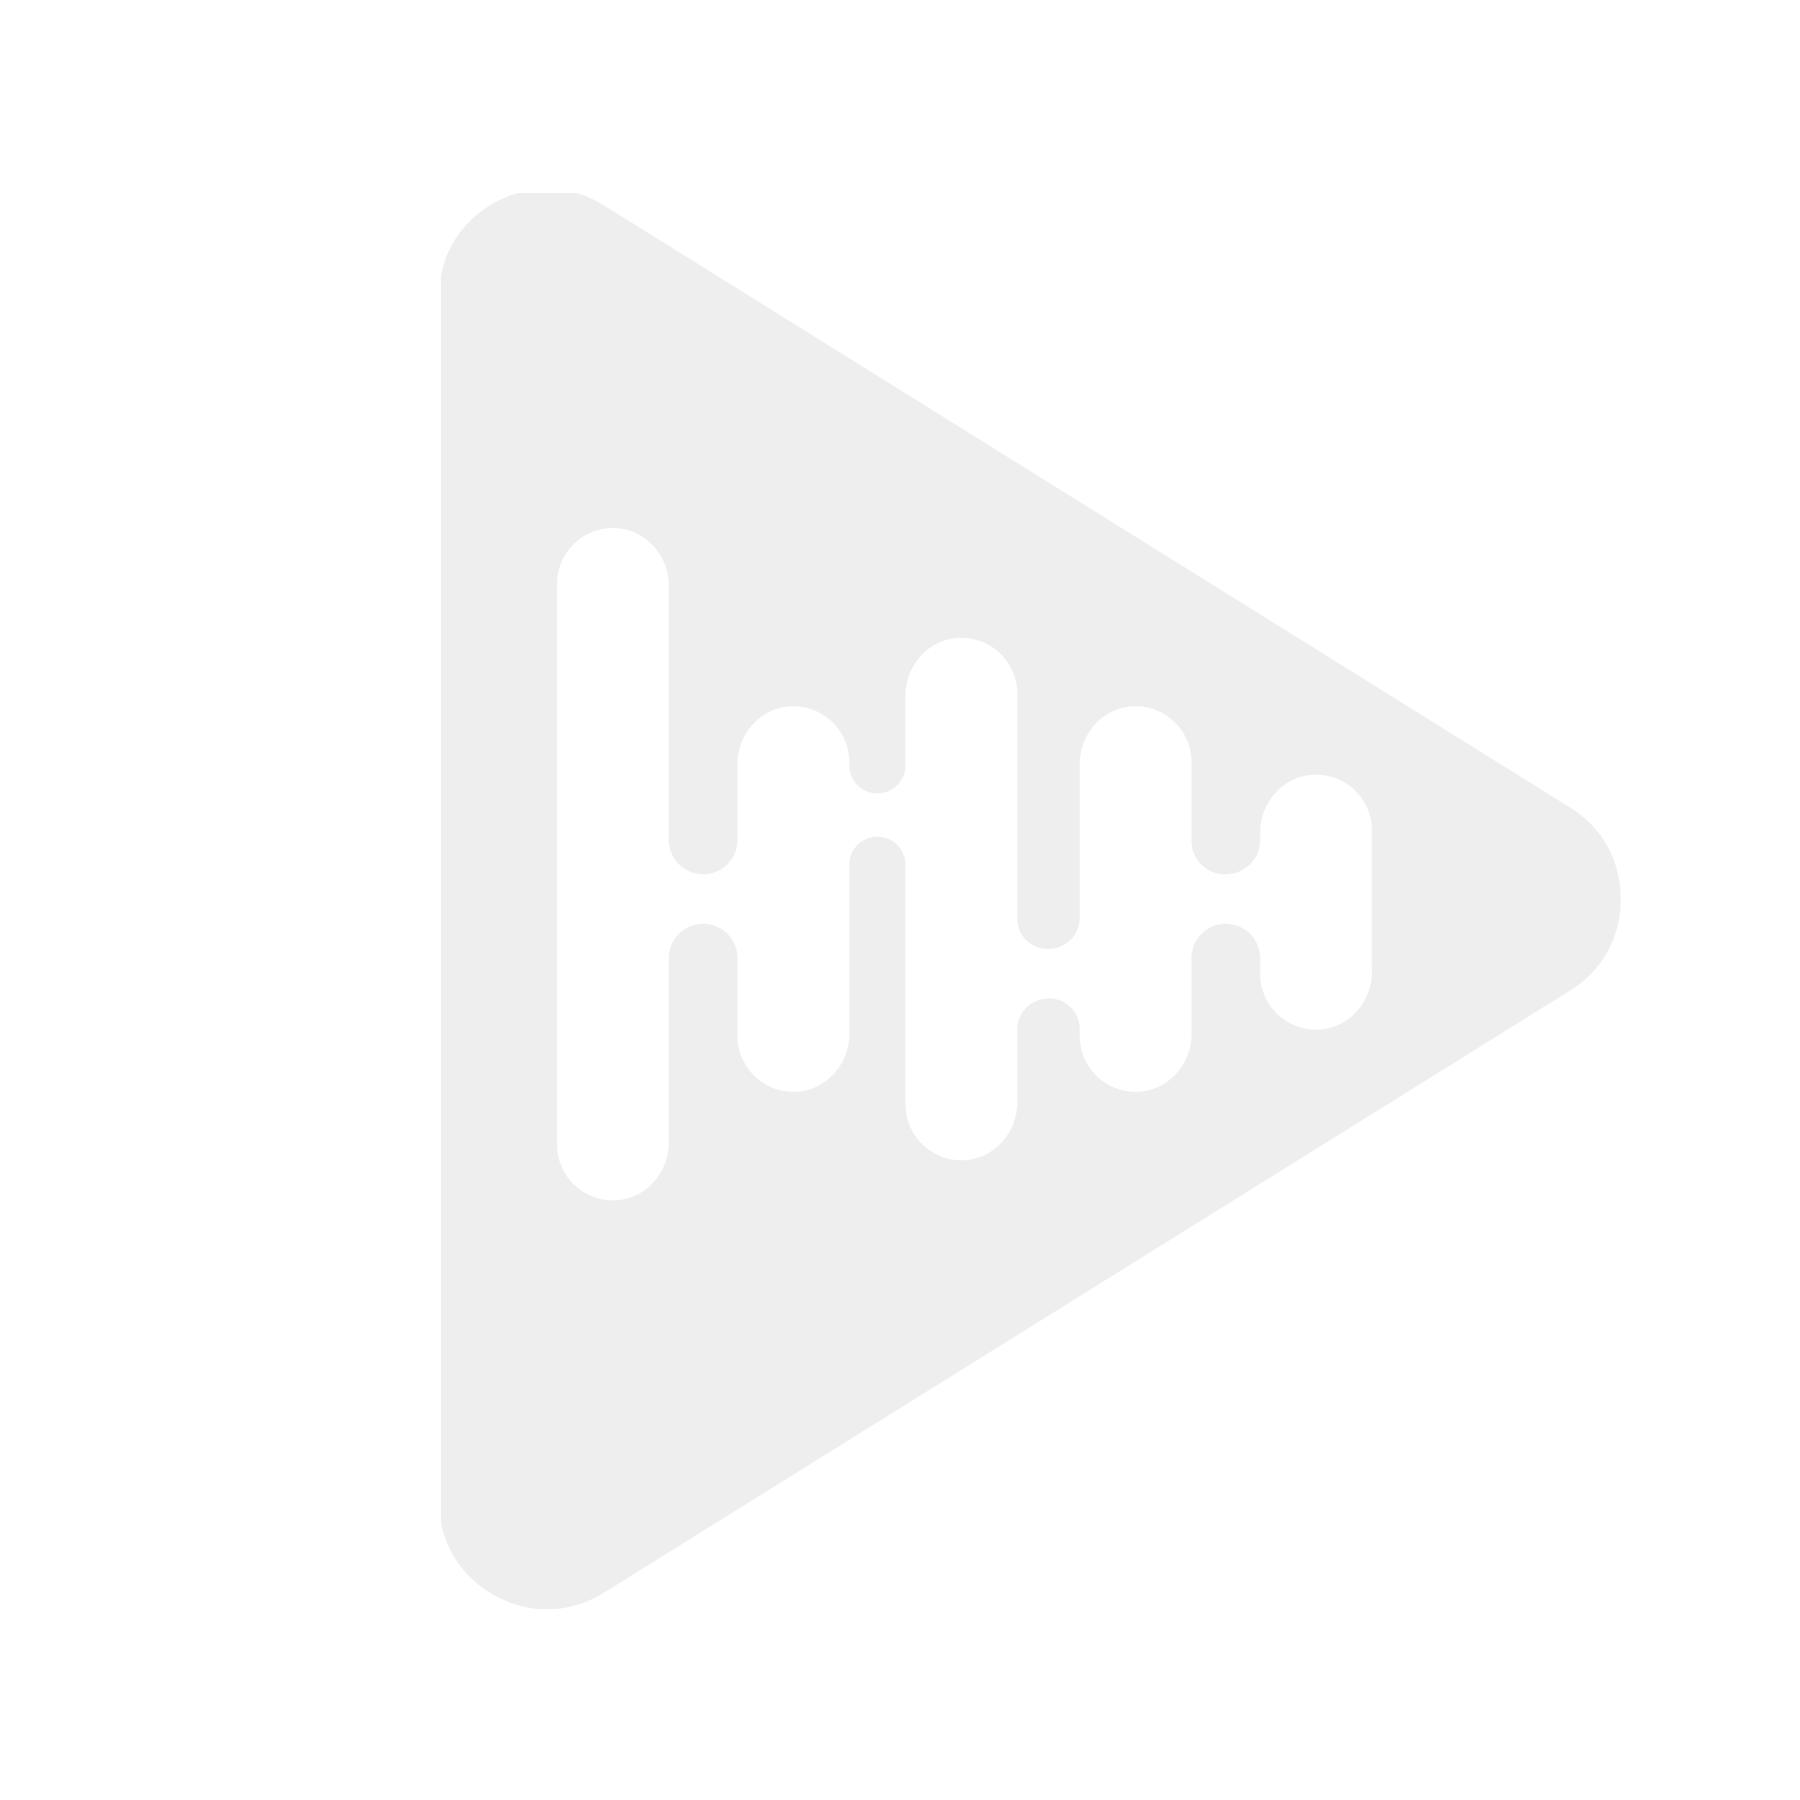 Autodab SWC C2DAB-HY2